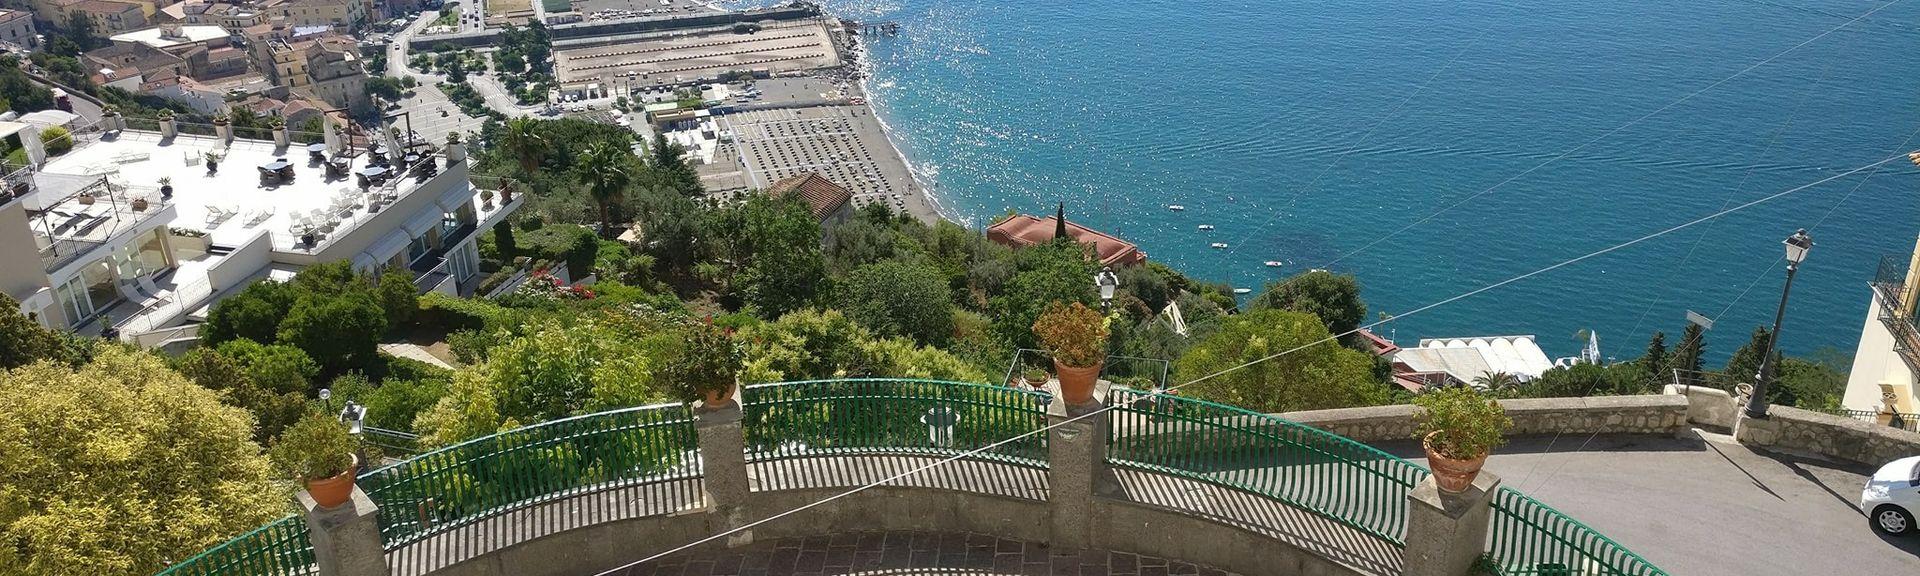 Salerno, Salerno, Campânia, Itália